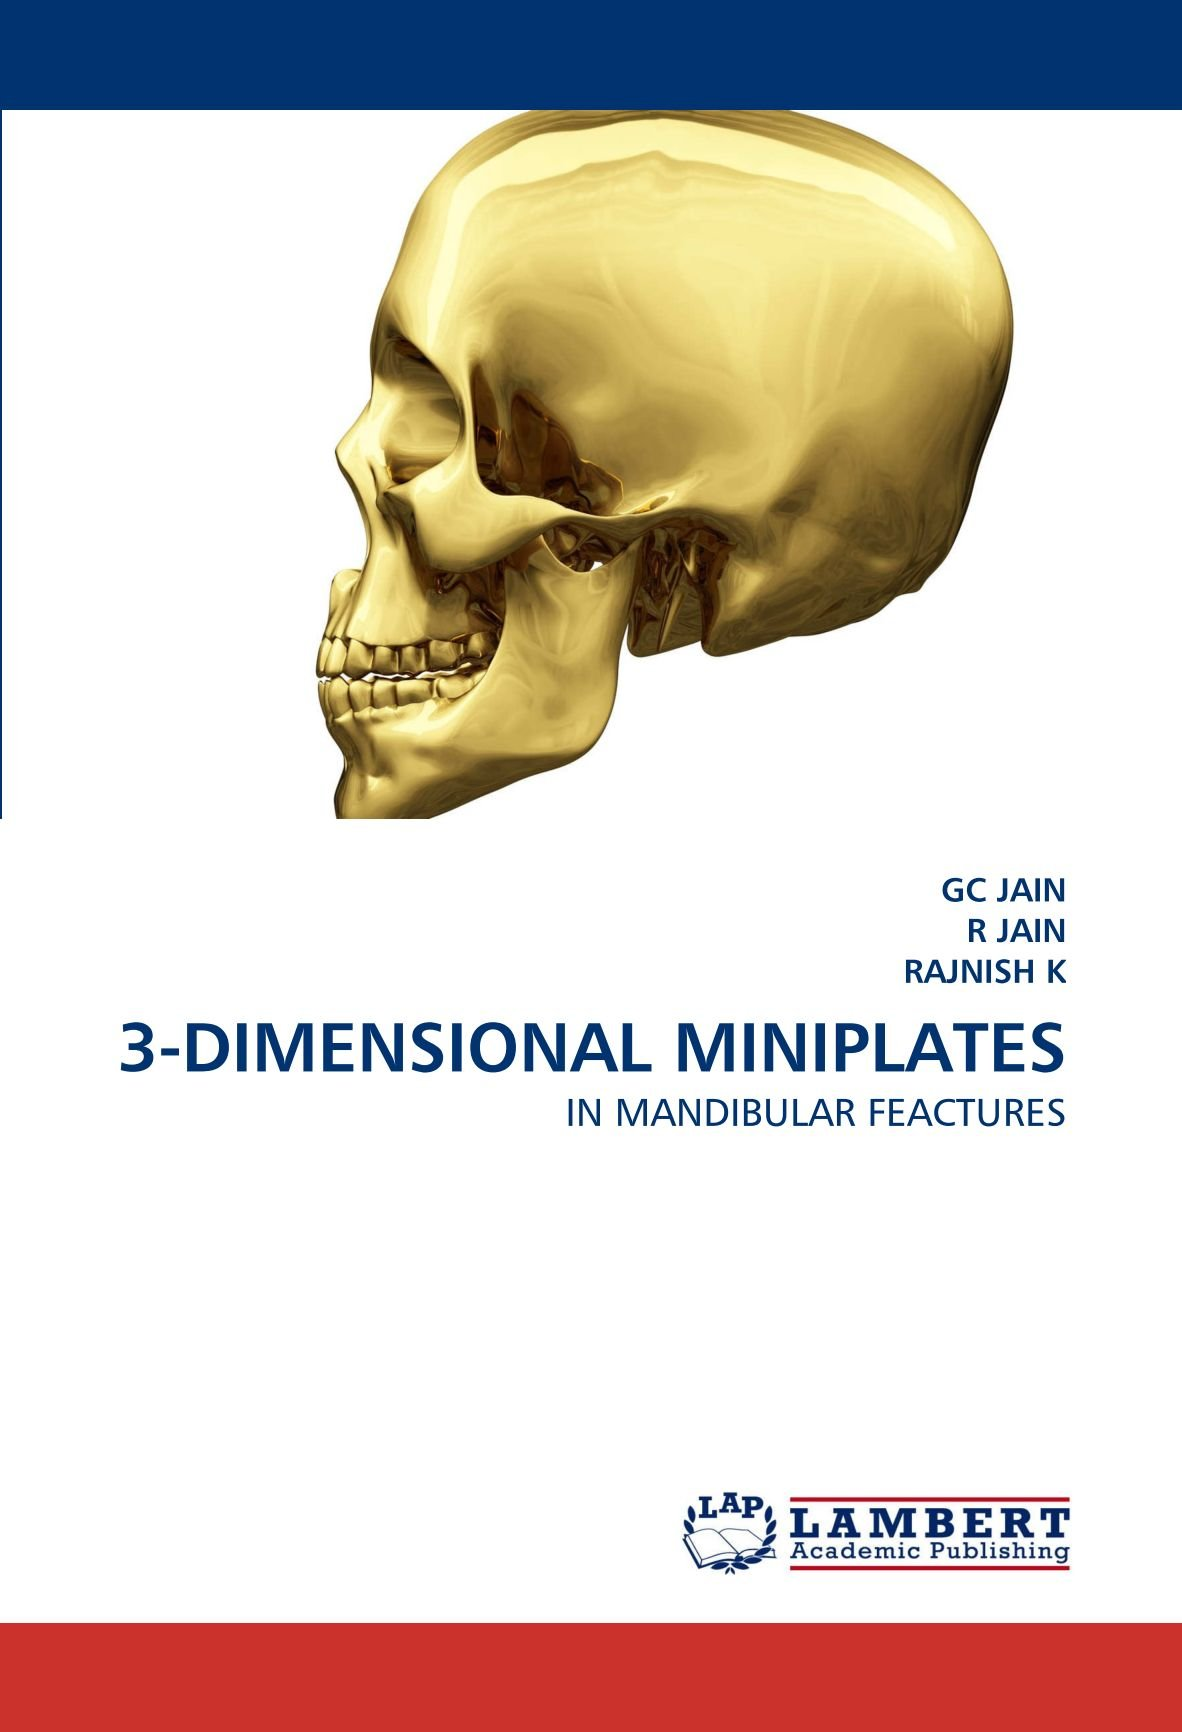 3-DIMENSIONAL MINIPLATES: IN MANDIBULAR FEACTURES pdf